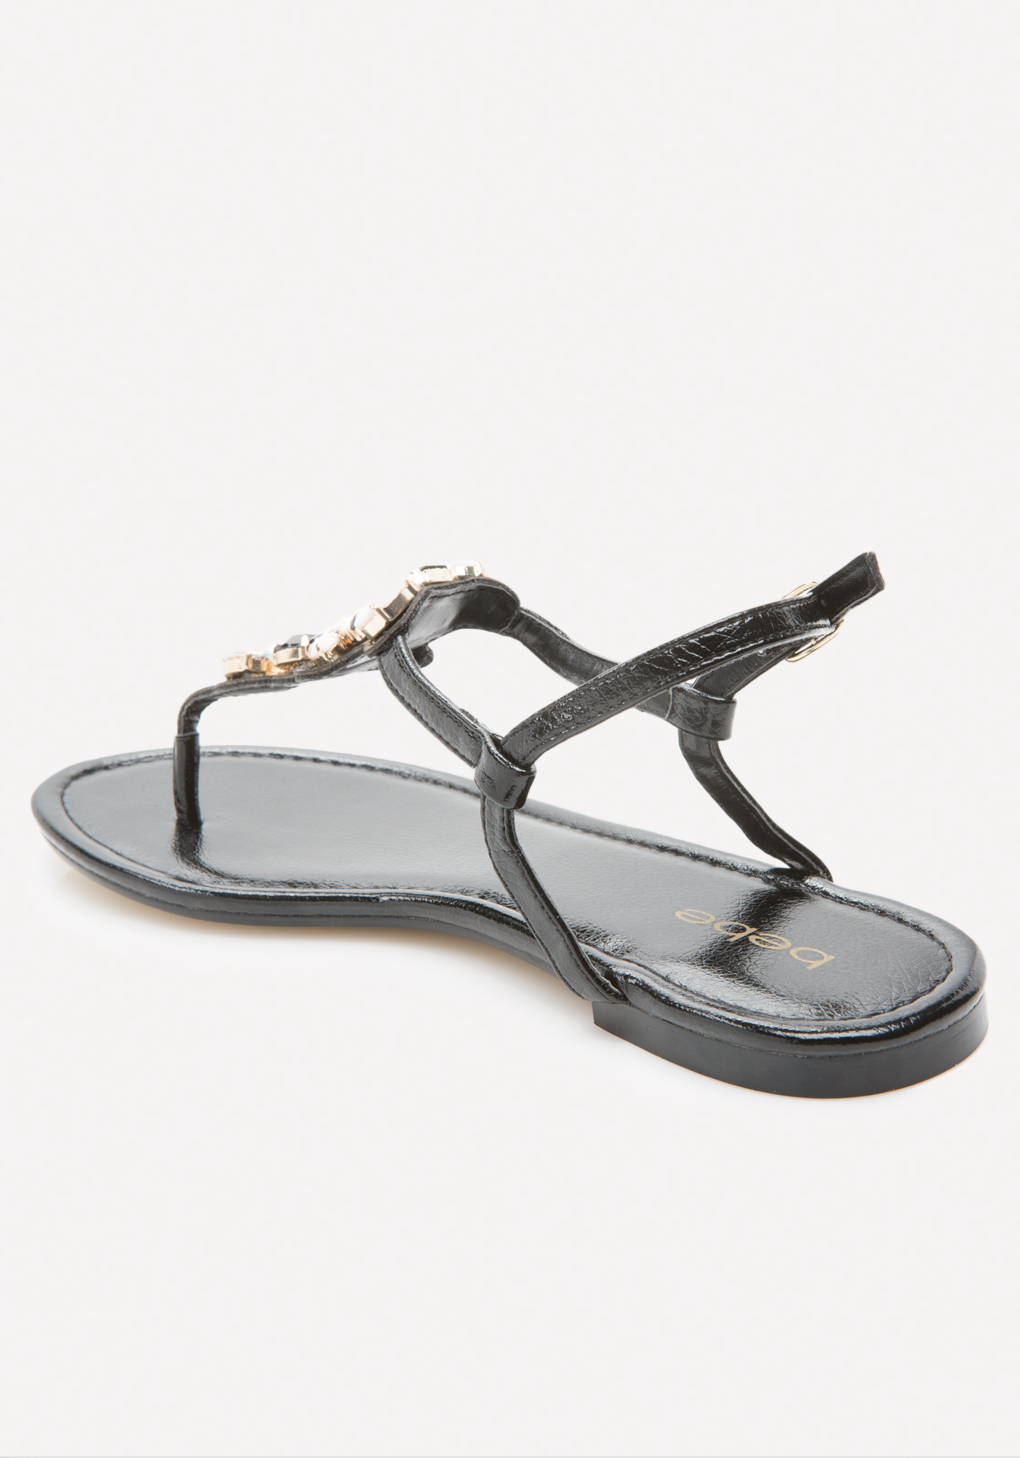 d040f63a5e6f42 Lyst - Bebe Shaya Jeweled Flat Sandals